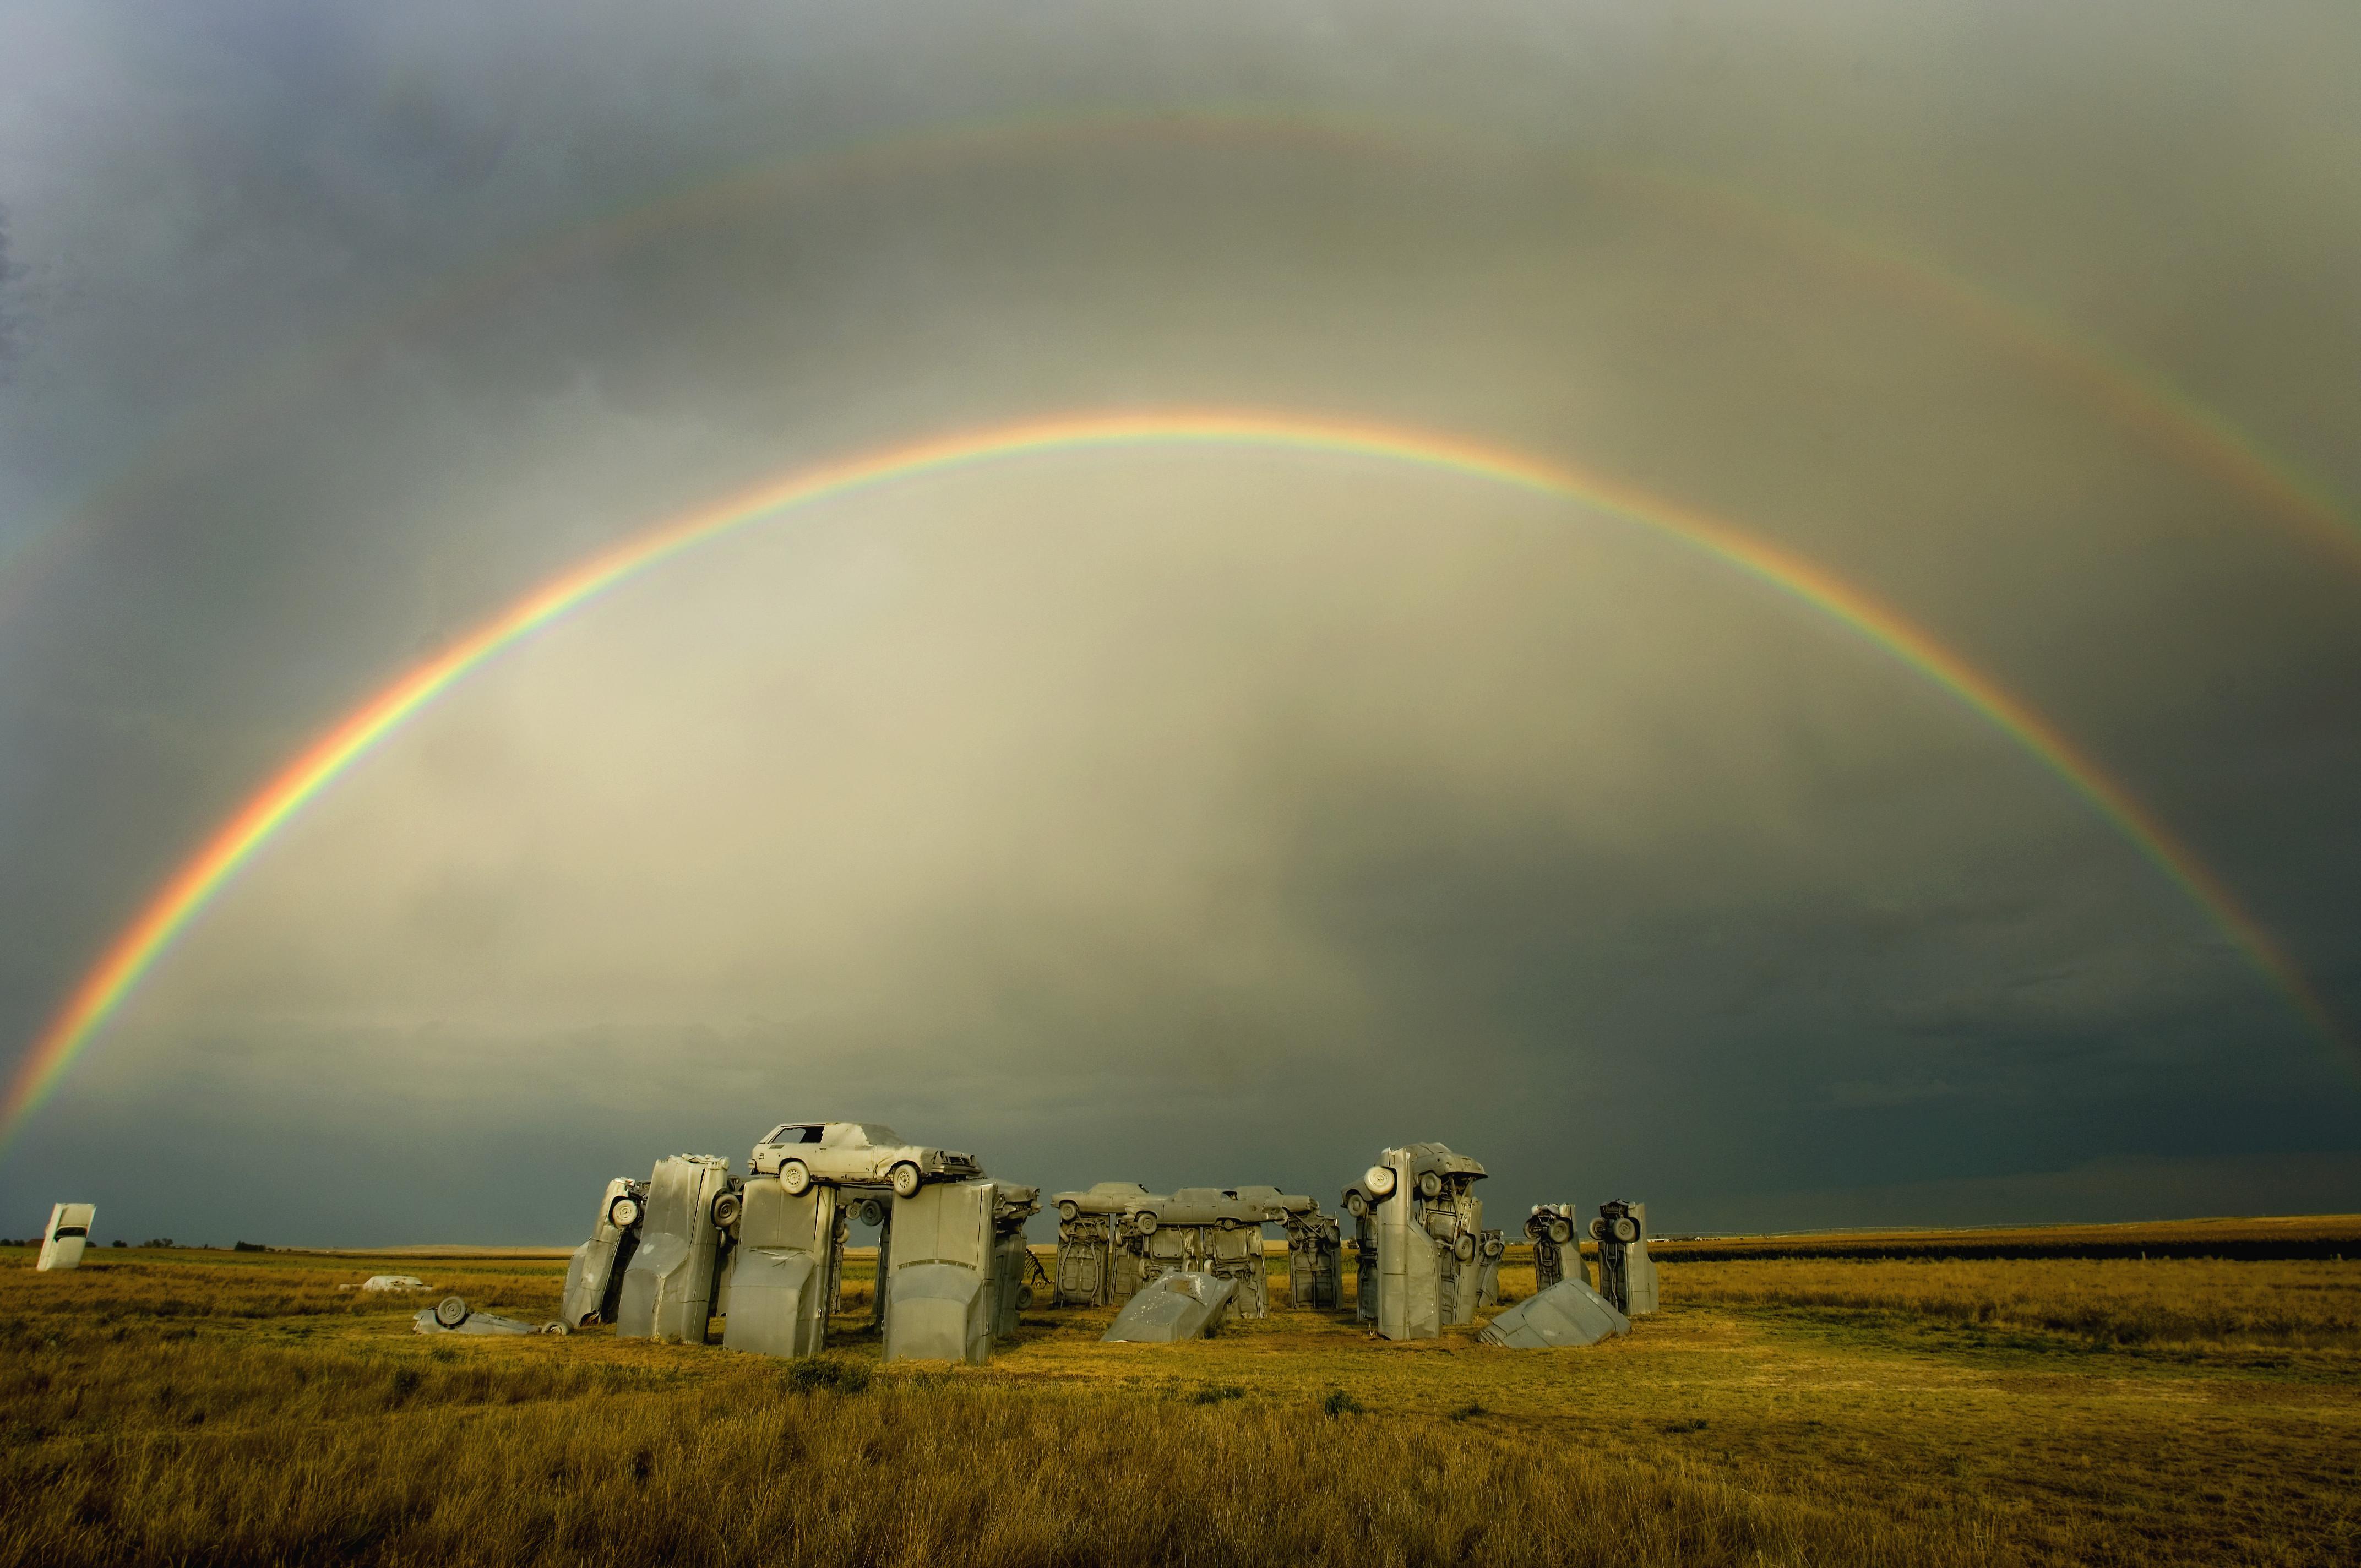 roadside-sculpture - Nebraska Pictures - Nebraska - HISTORY.com